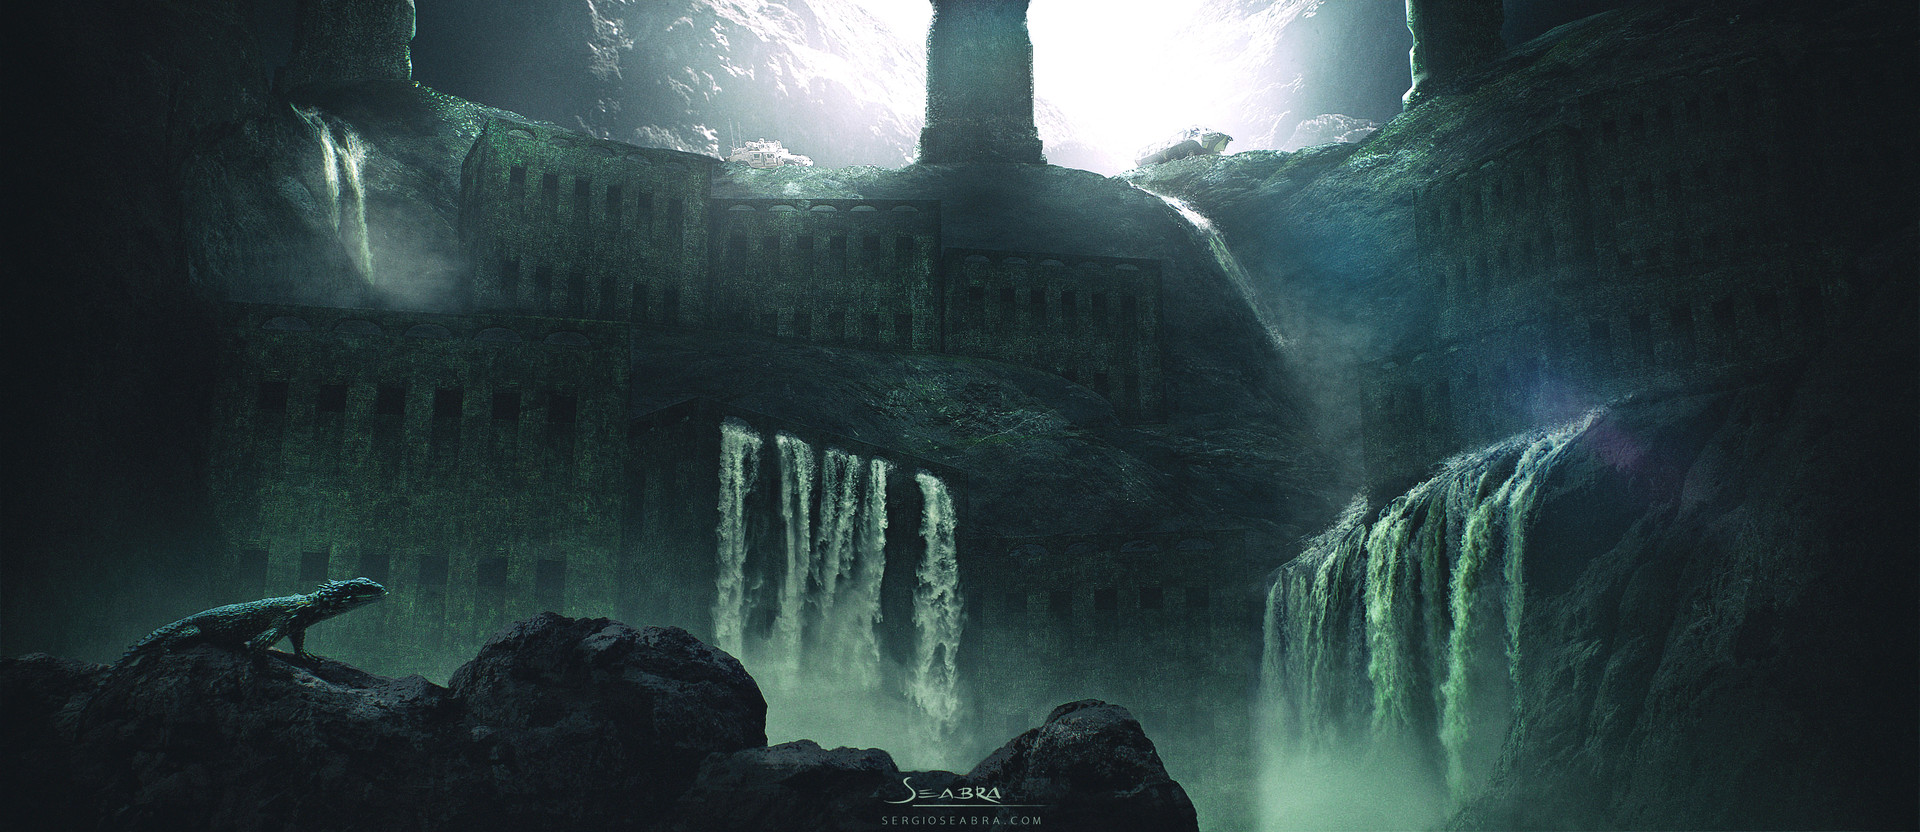 Sergio seabra waterfall ruins posta3 sergioseabra